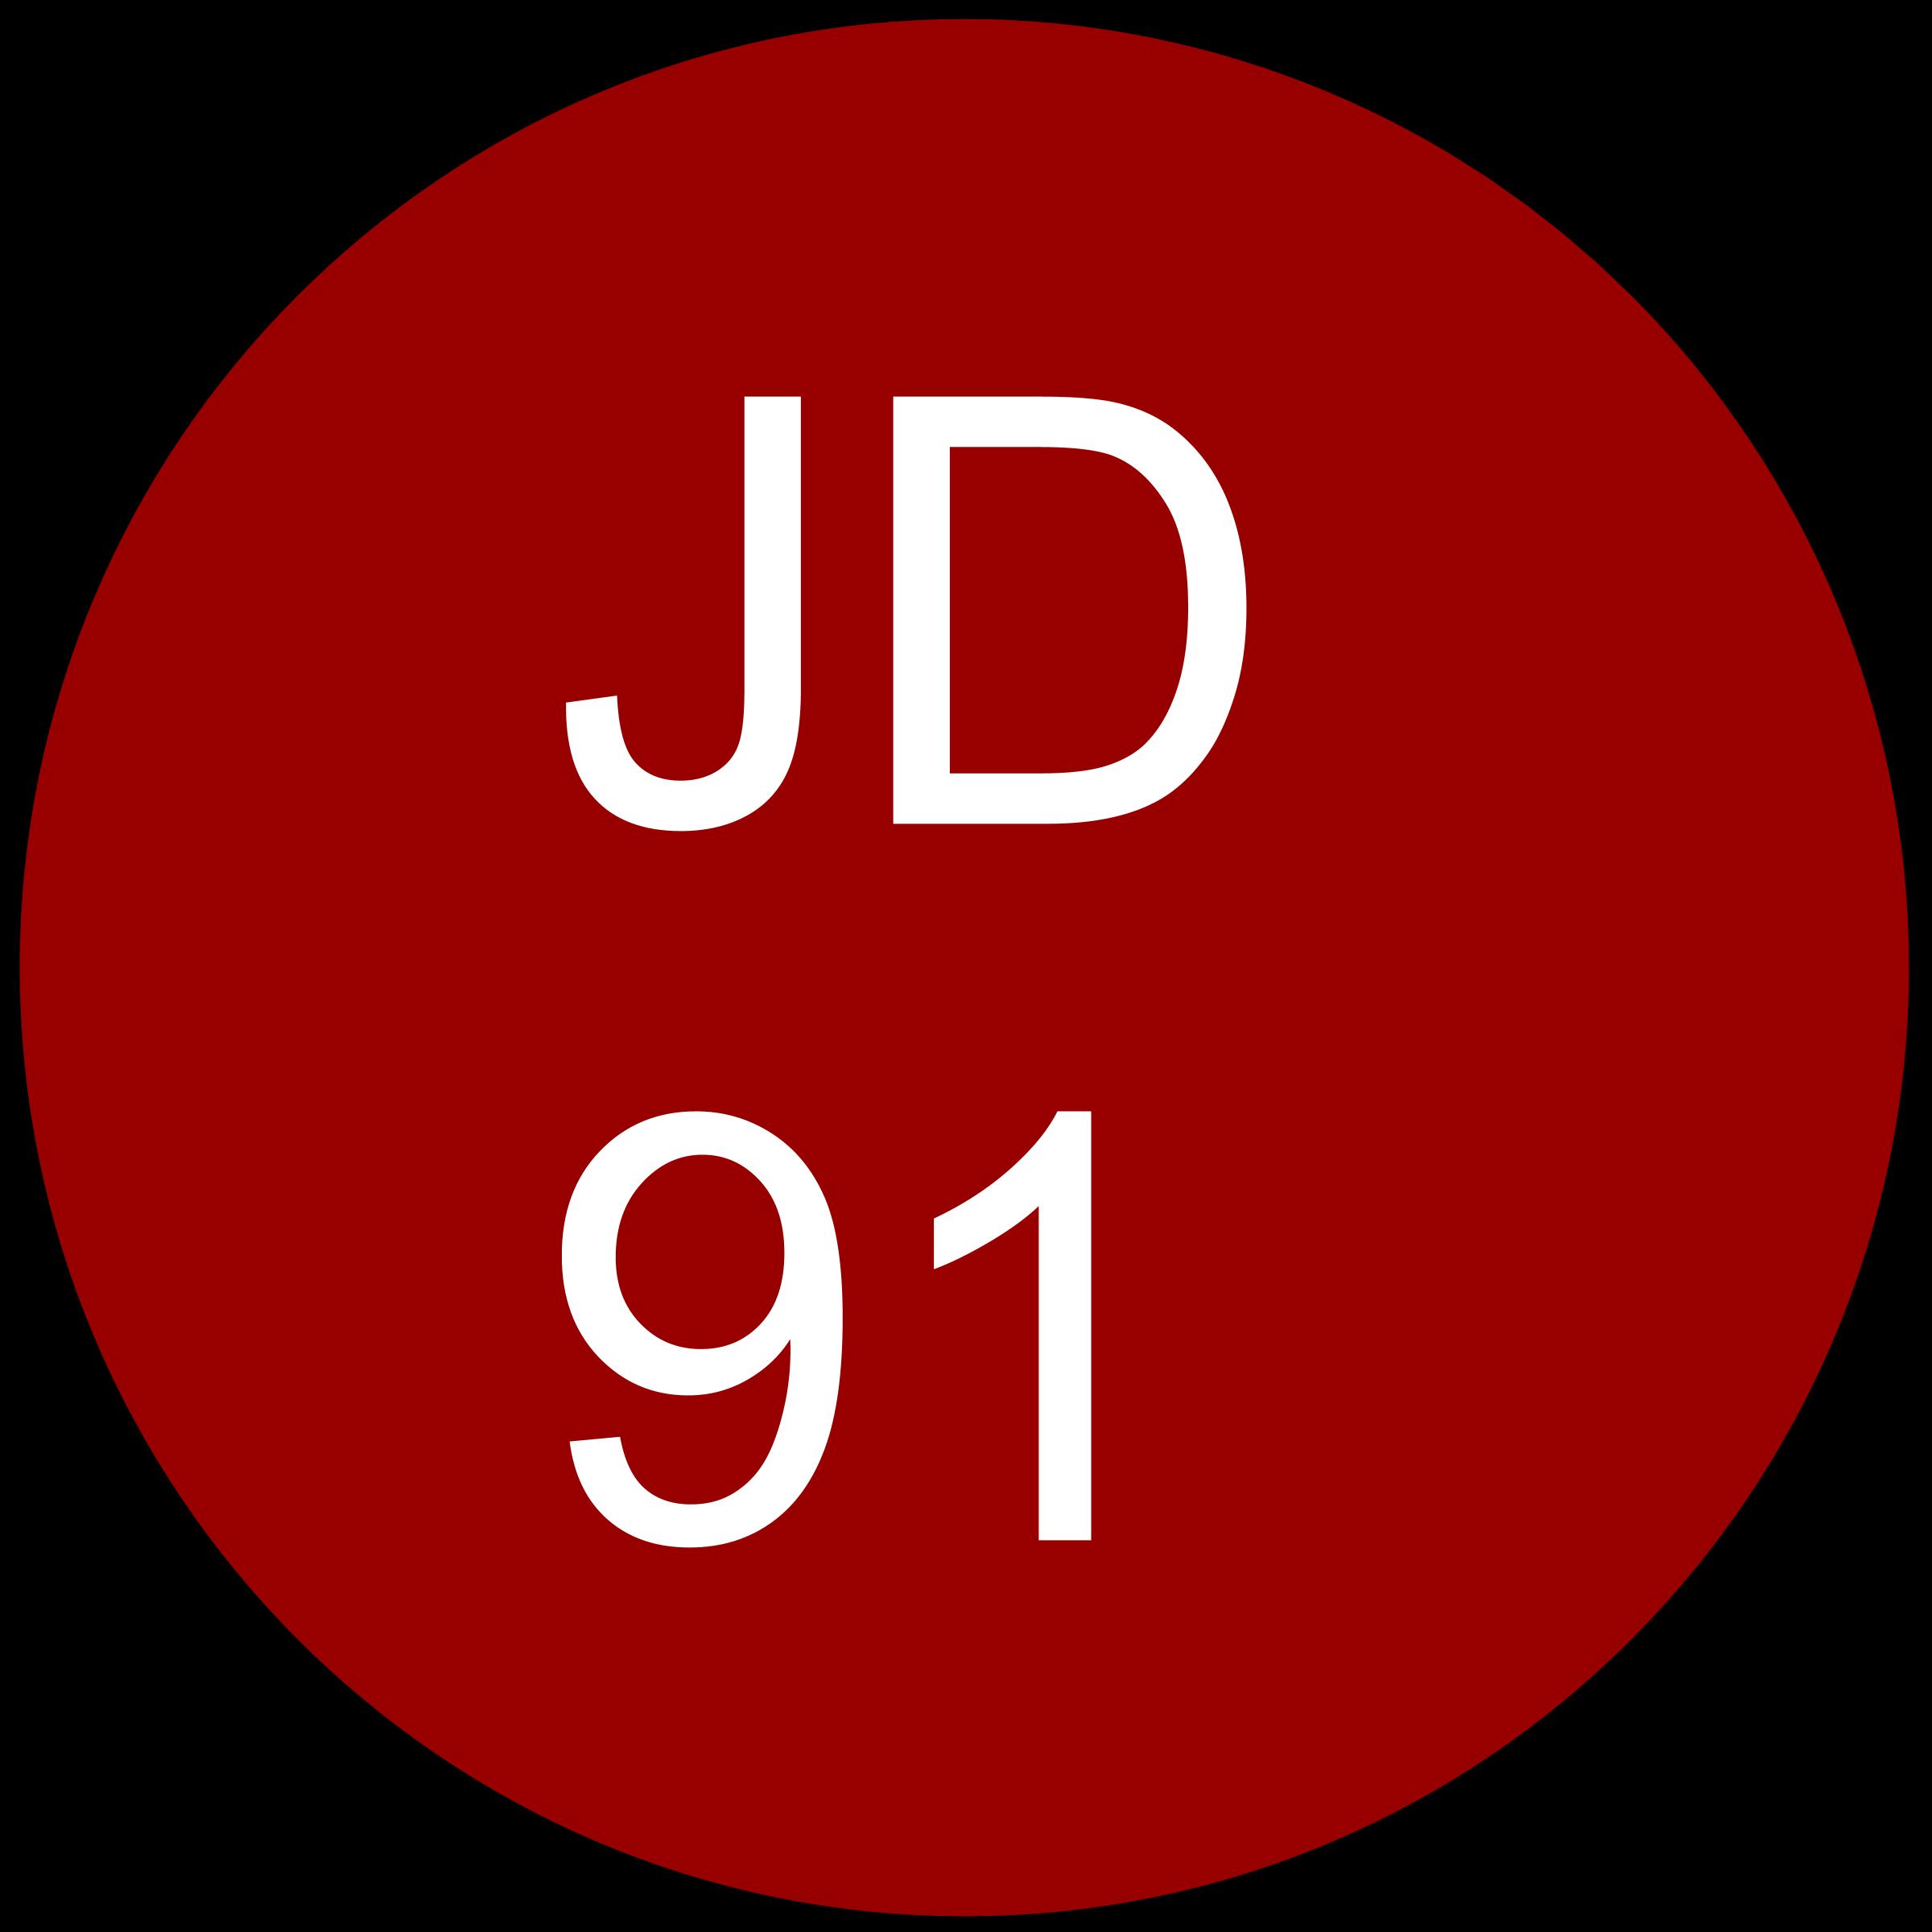 jeb-dunnuck-91-ratings